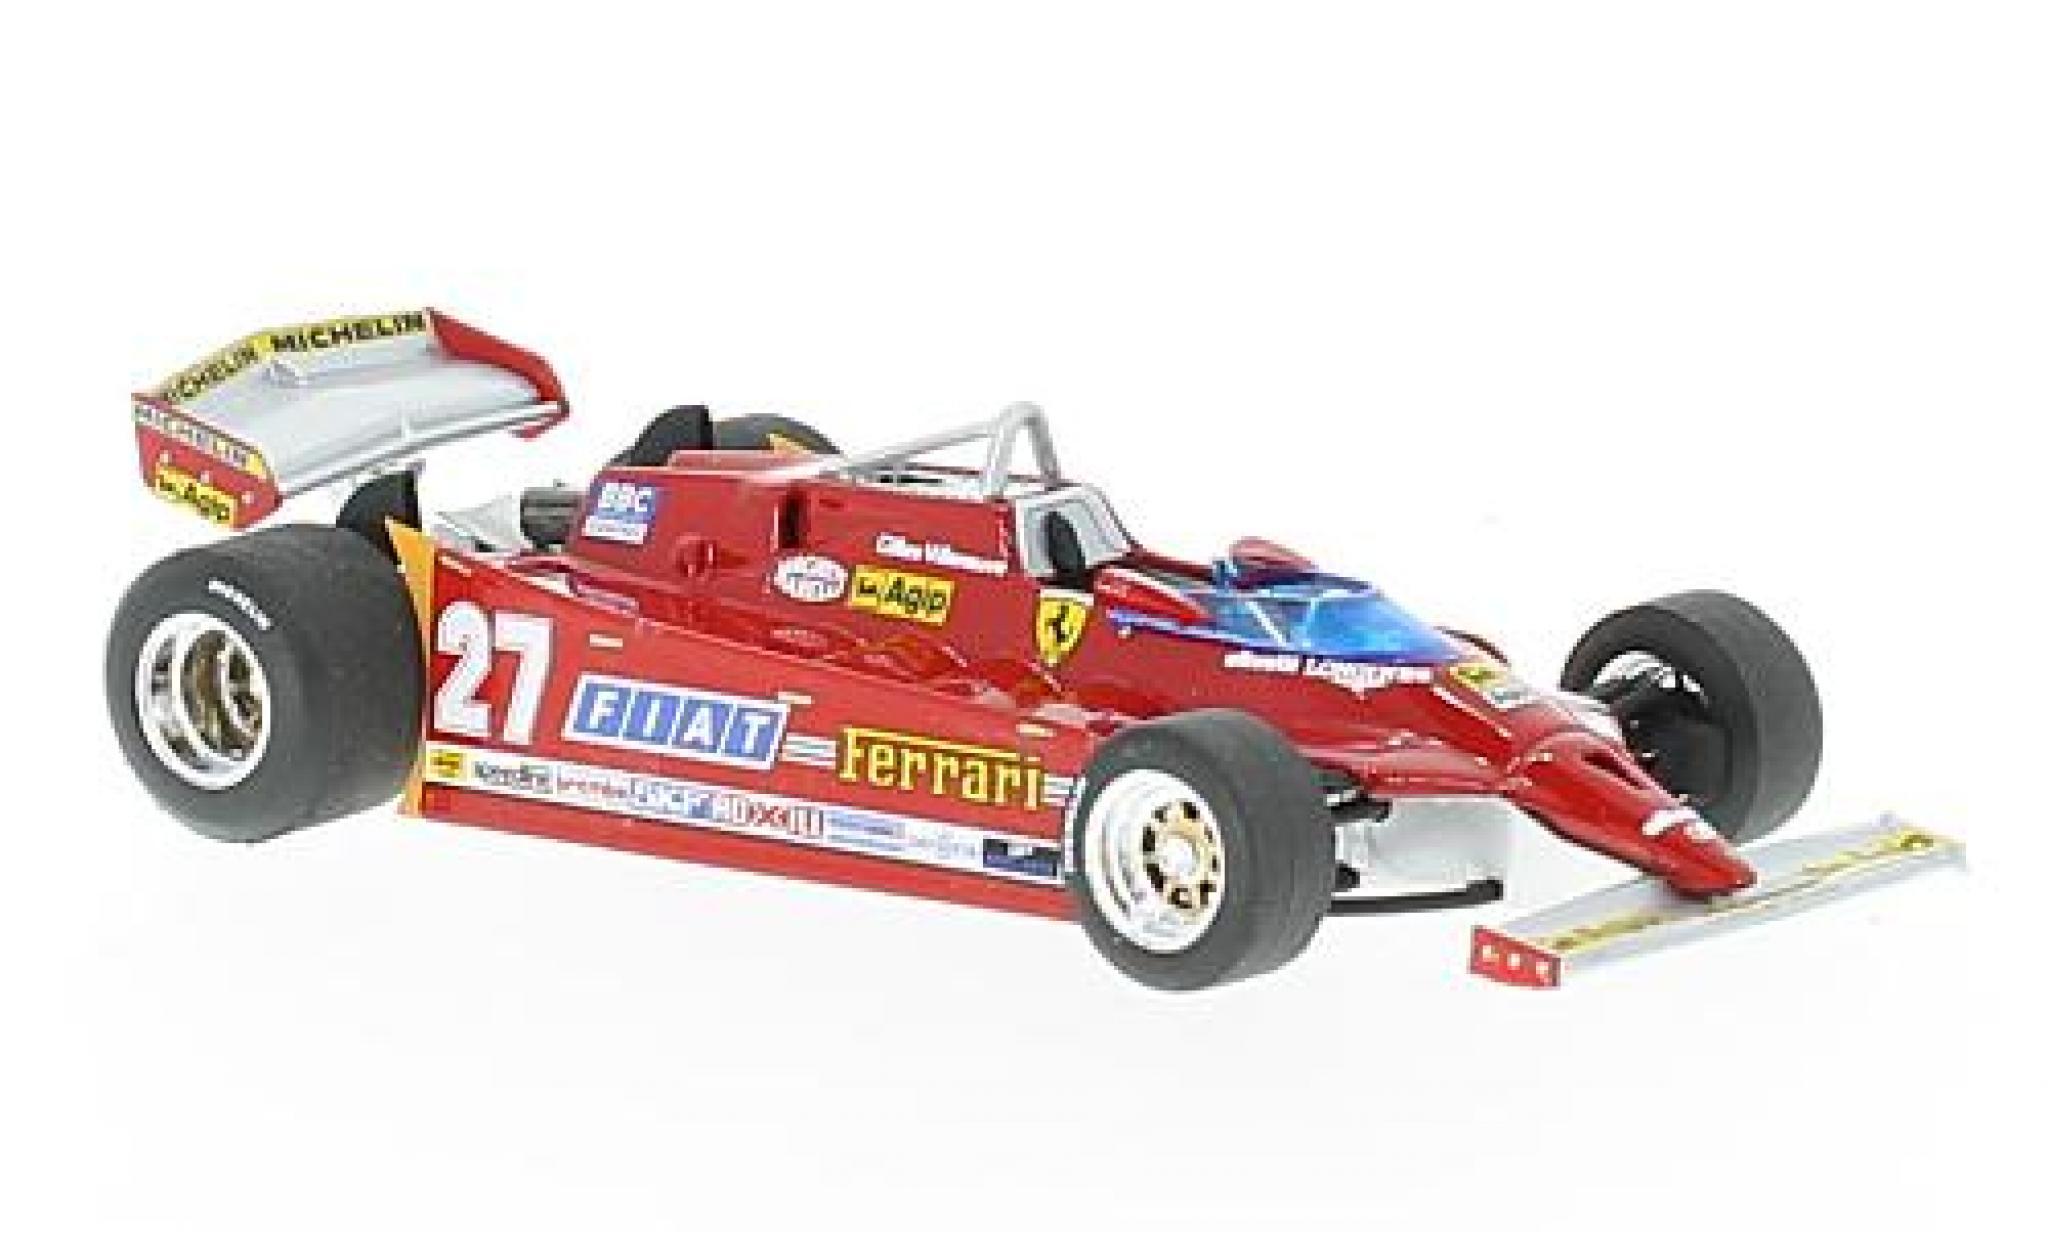 Ferrari 126 1/43 Brumm CX comprex No.27 Formel 1 GP USA 1981 G.Villeneuve